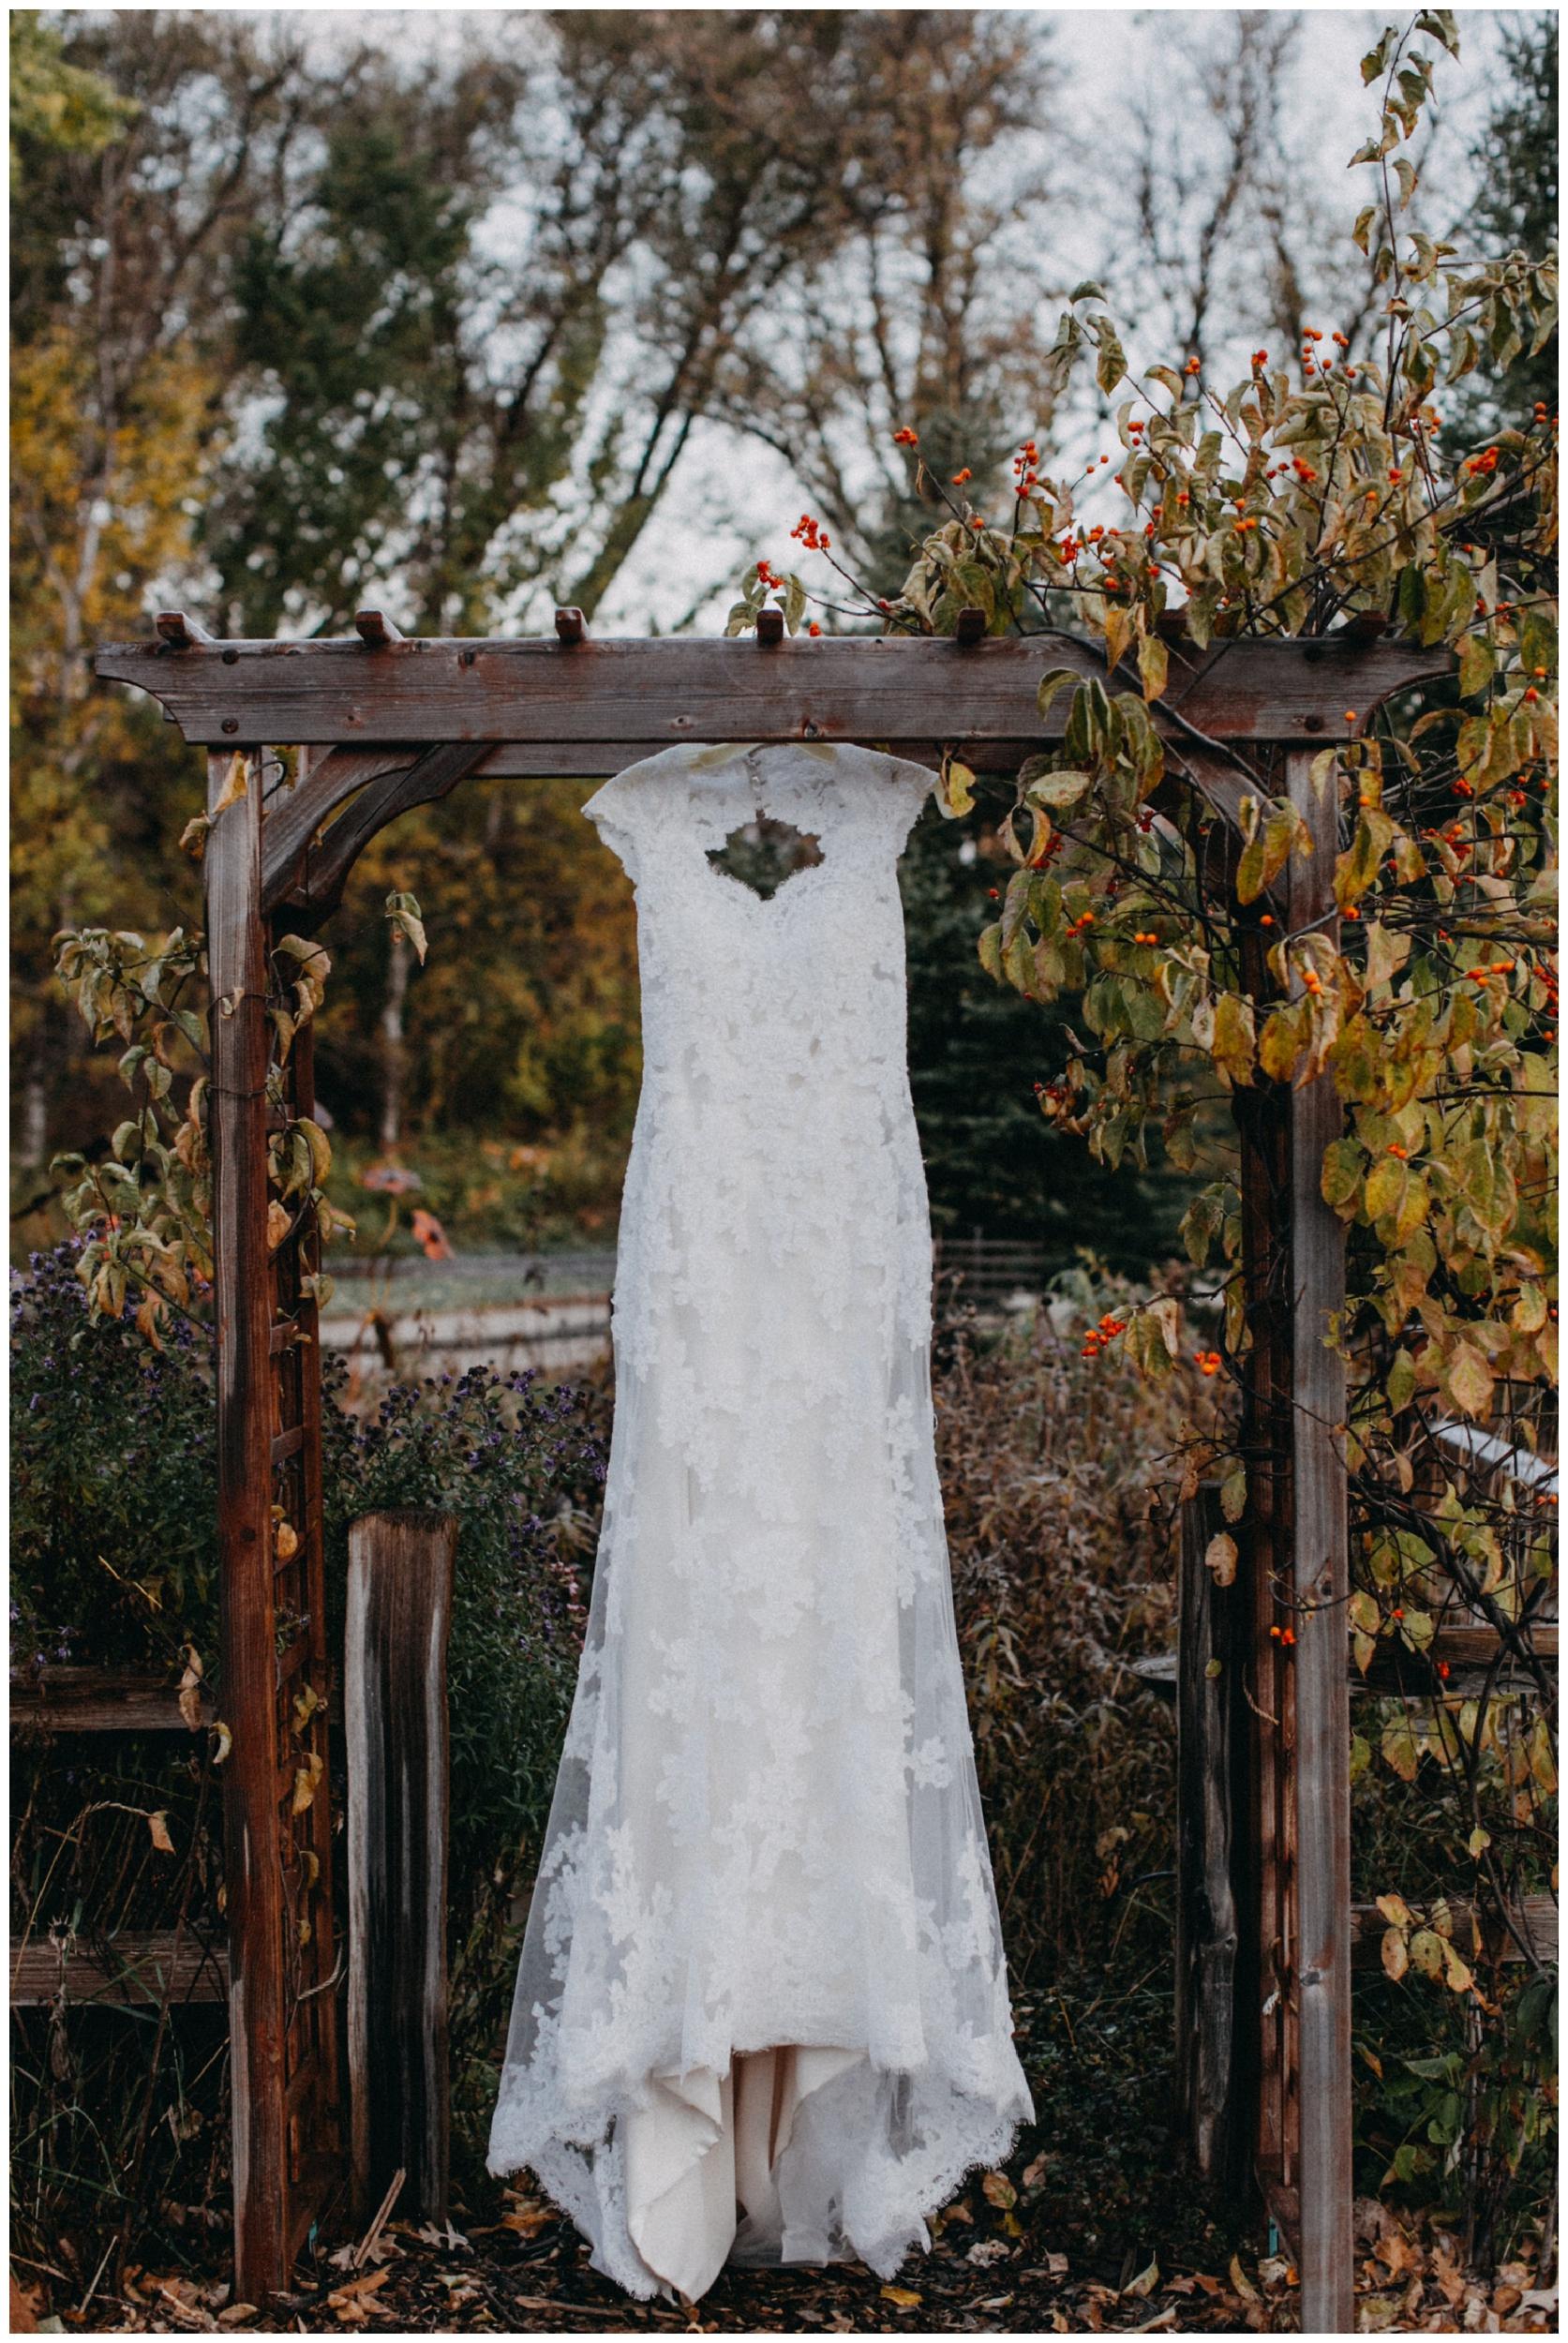 Romantic vintage wedding dress hanging outside the Northland Arboretum